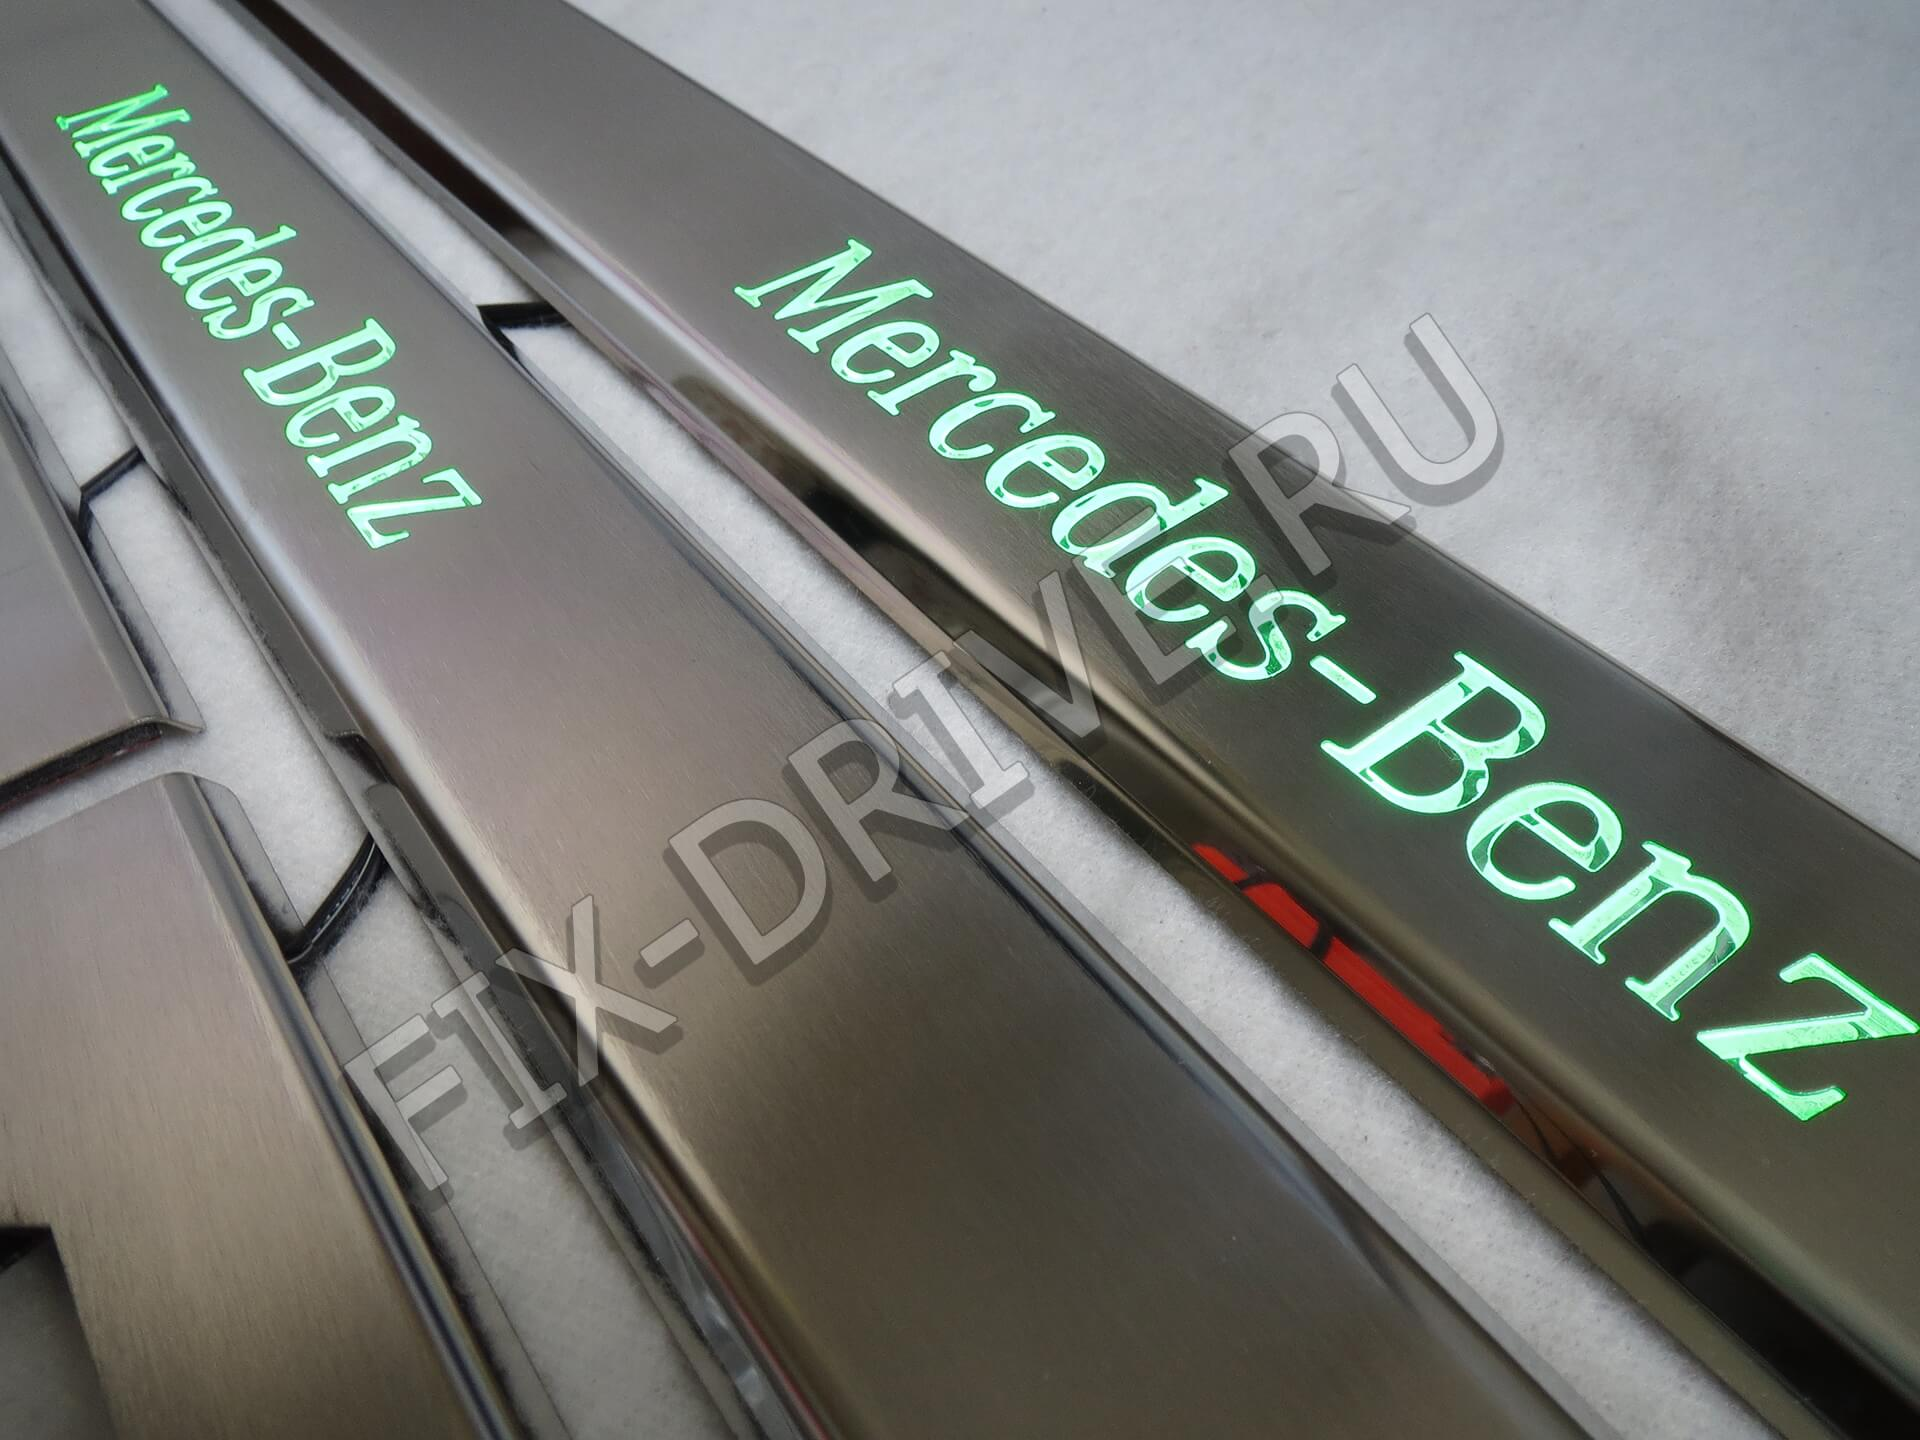 Пороги Mercedes w463 зеленая подсветка G-Class